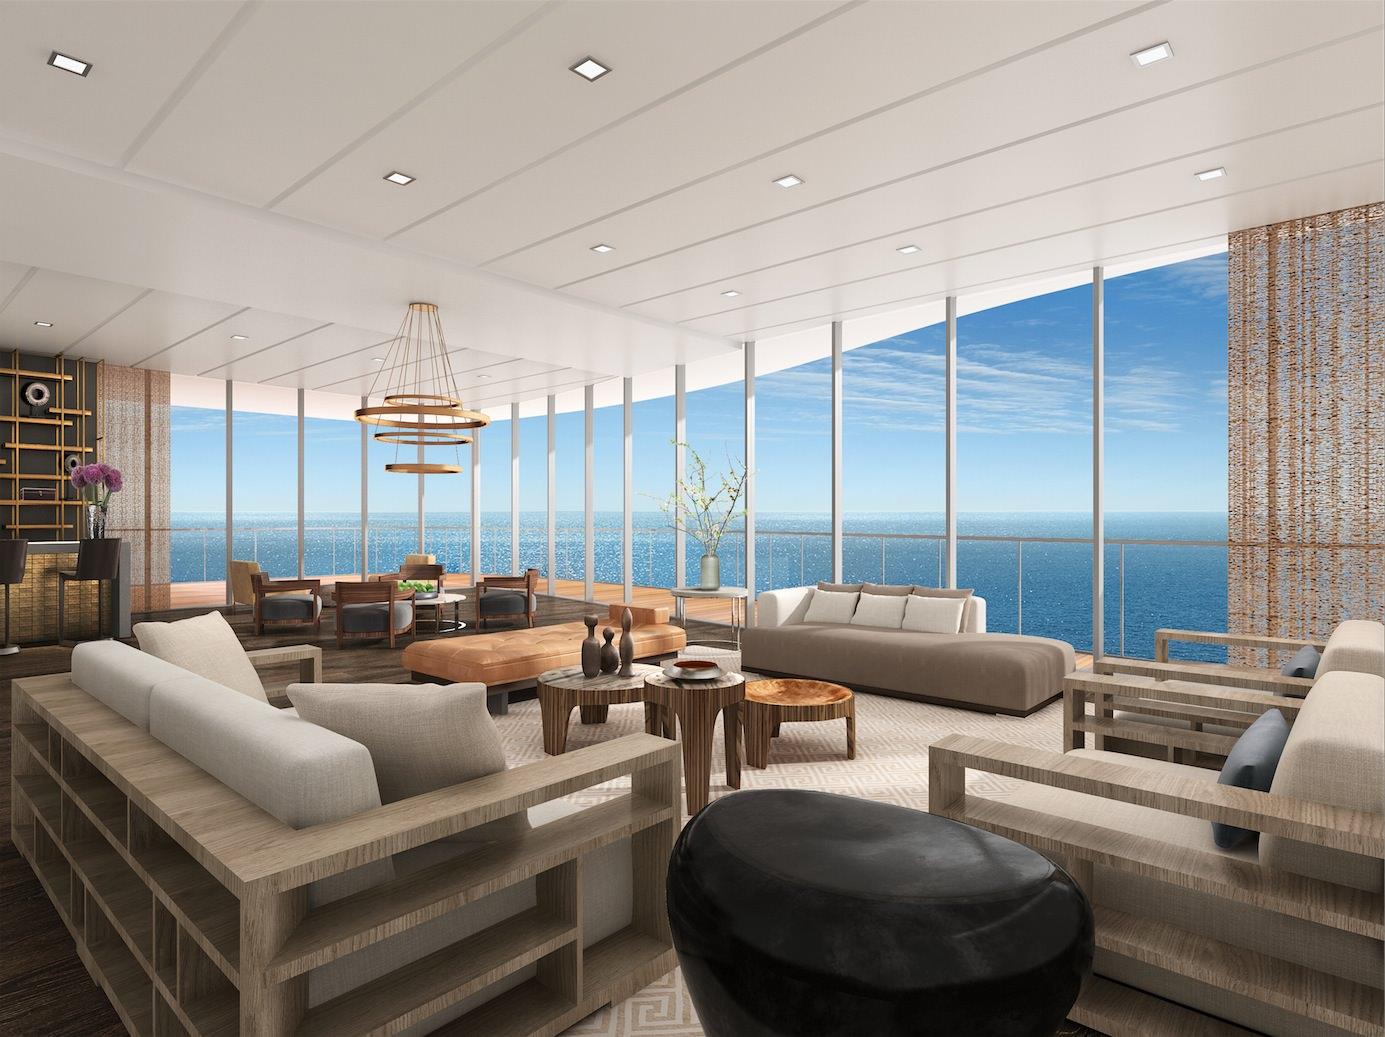 St Regis Bal Harbour Floor Plans Chateau Beach Condos For Sale Sunny Isles Beach